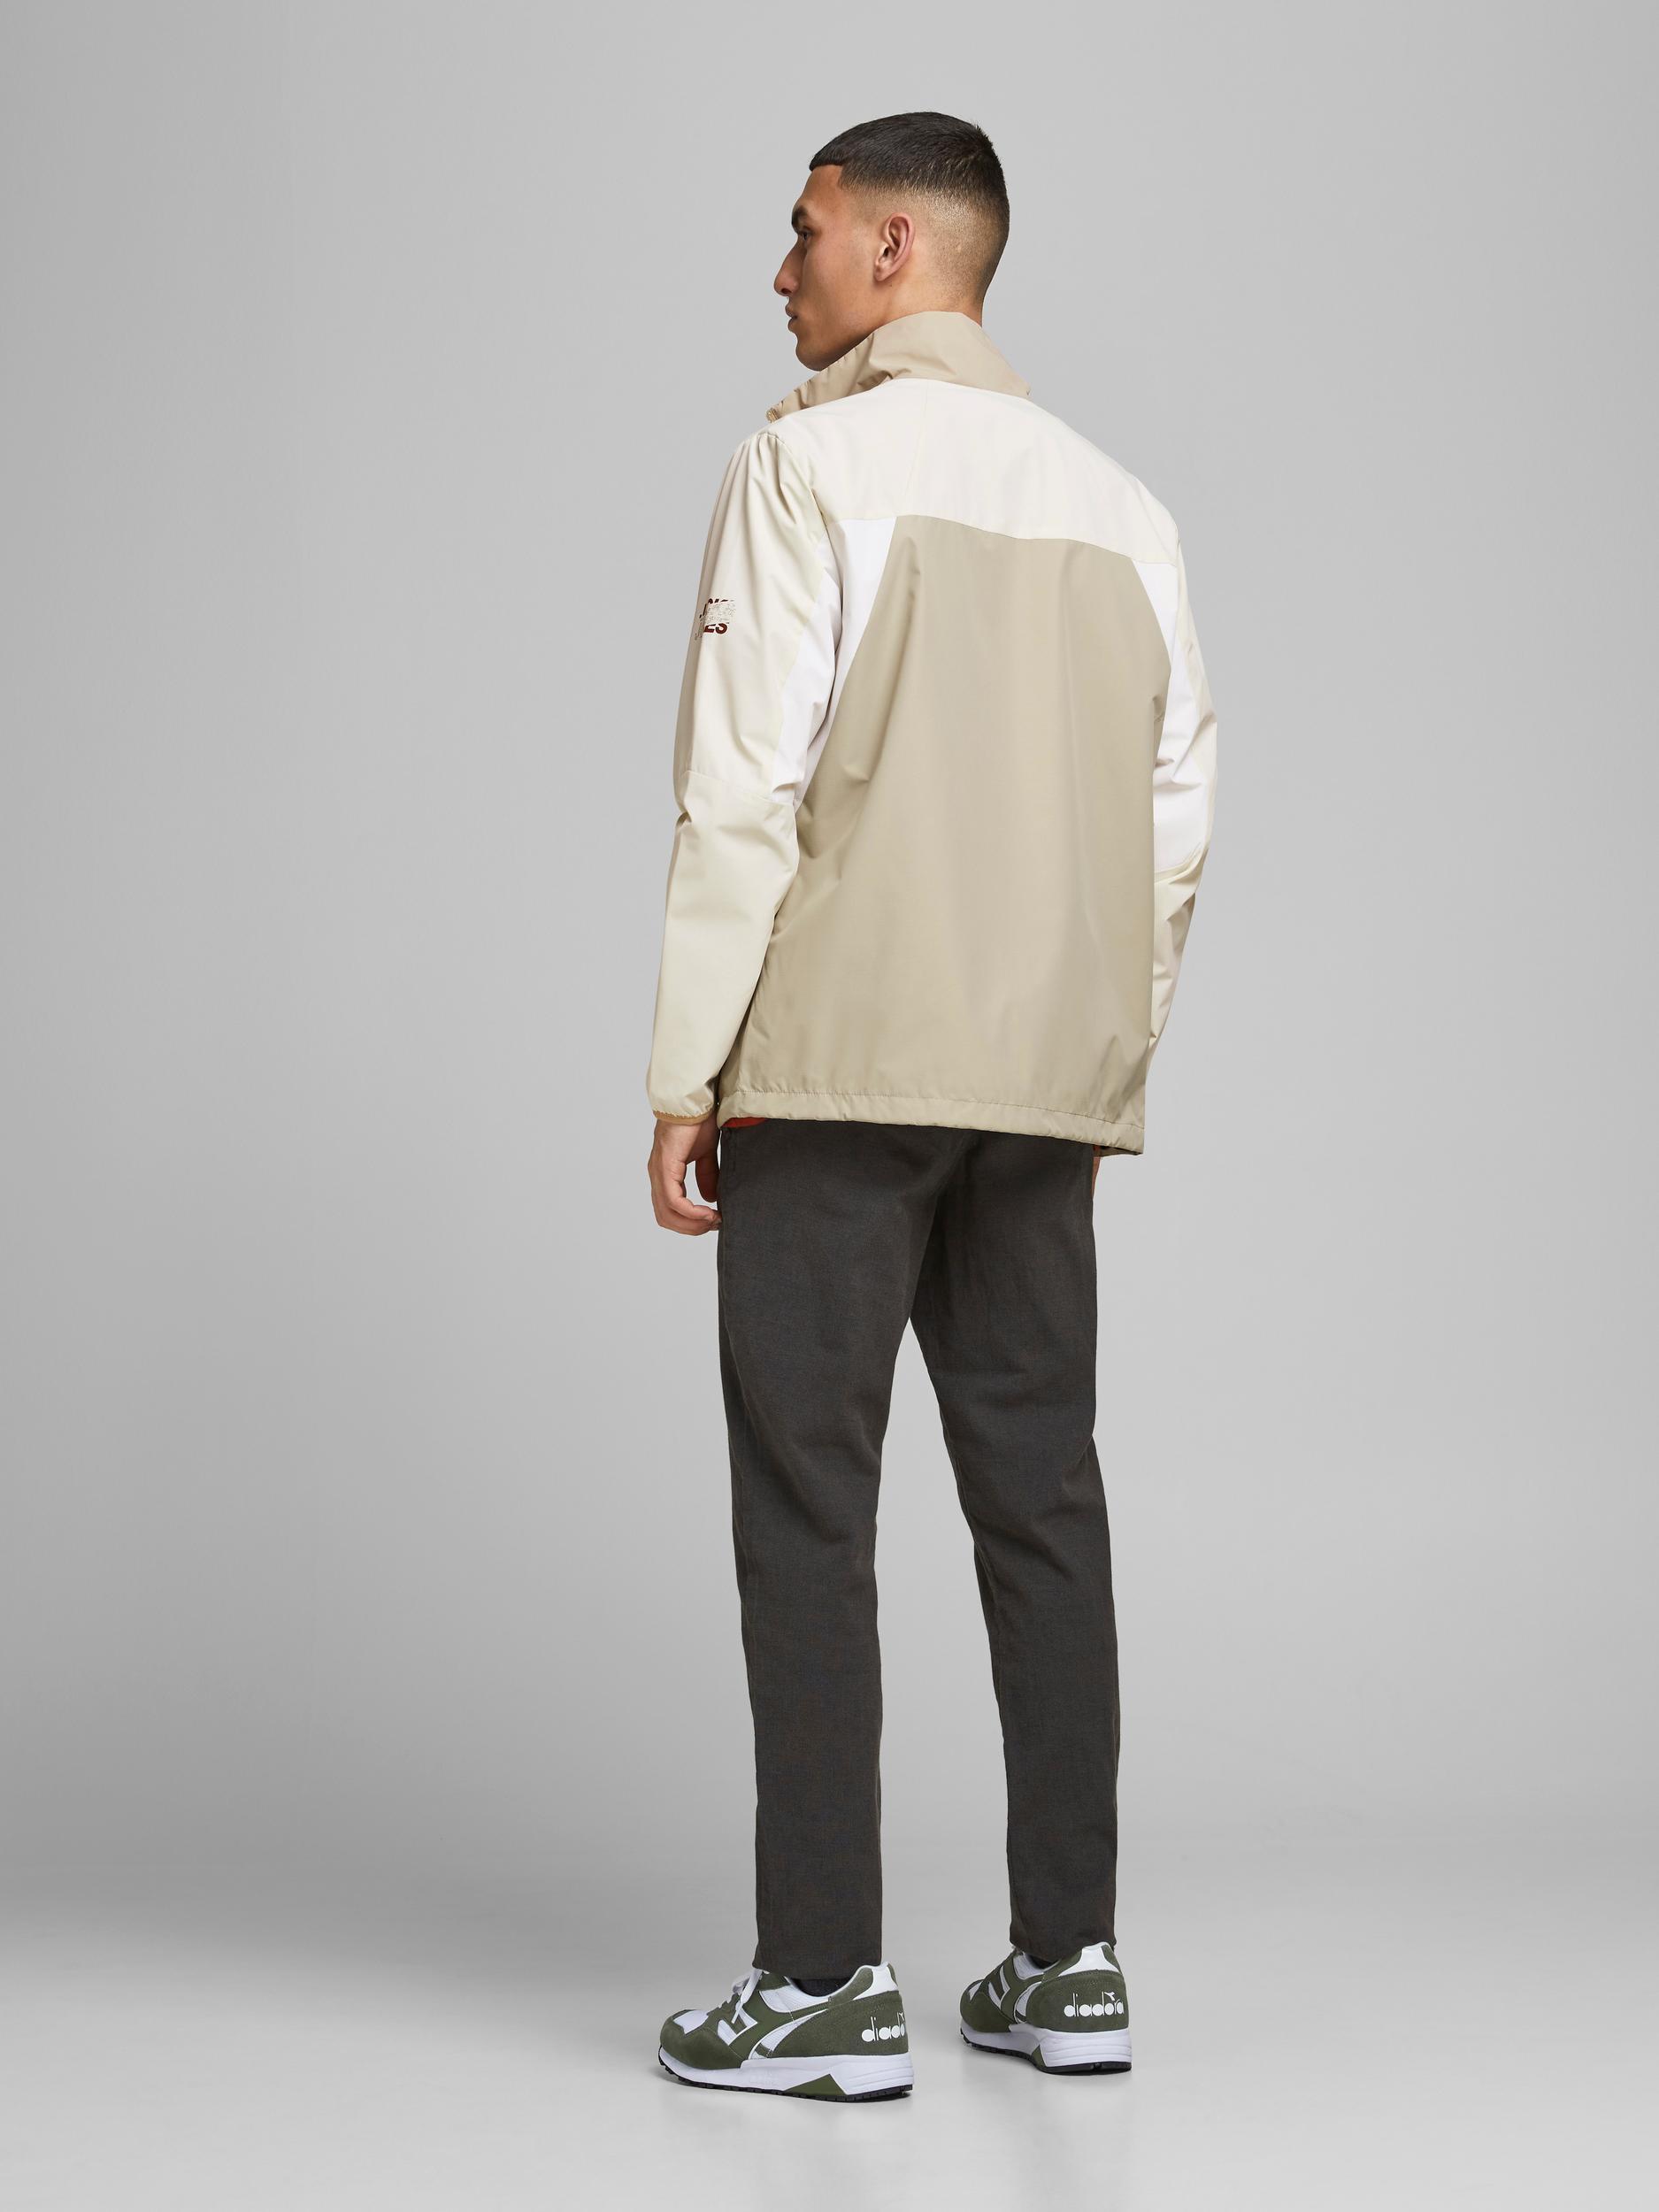 Jacke leicht collar